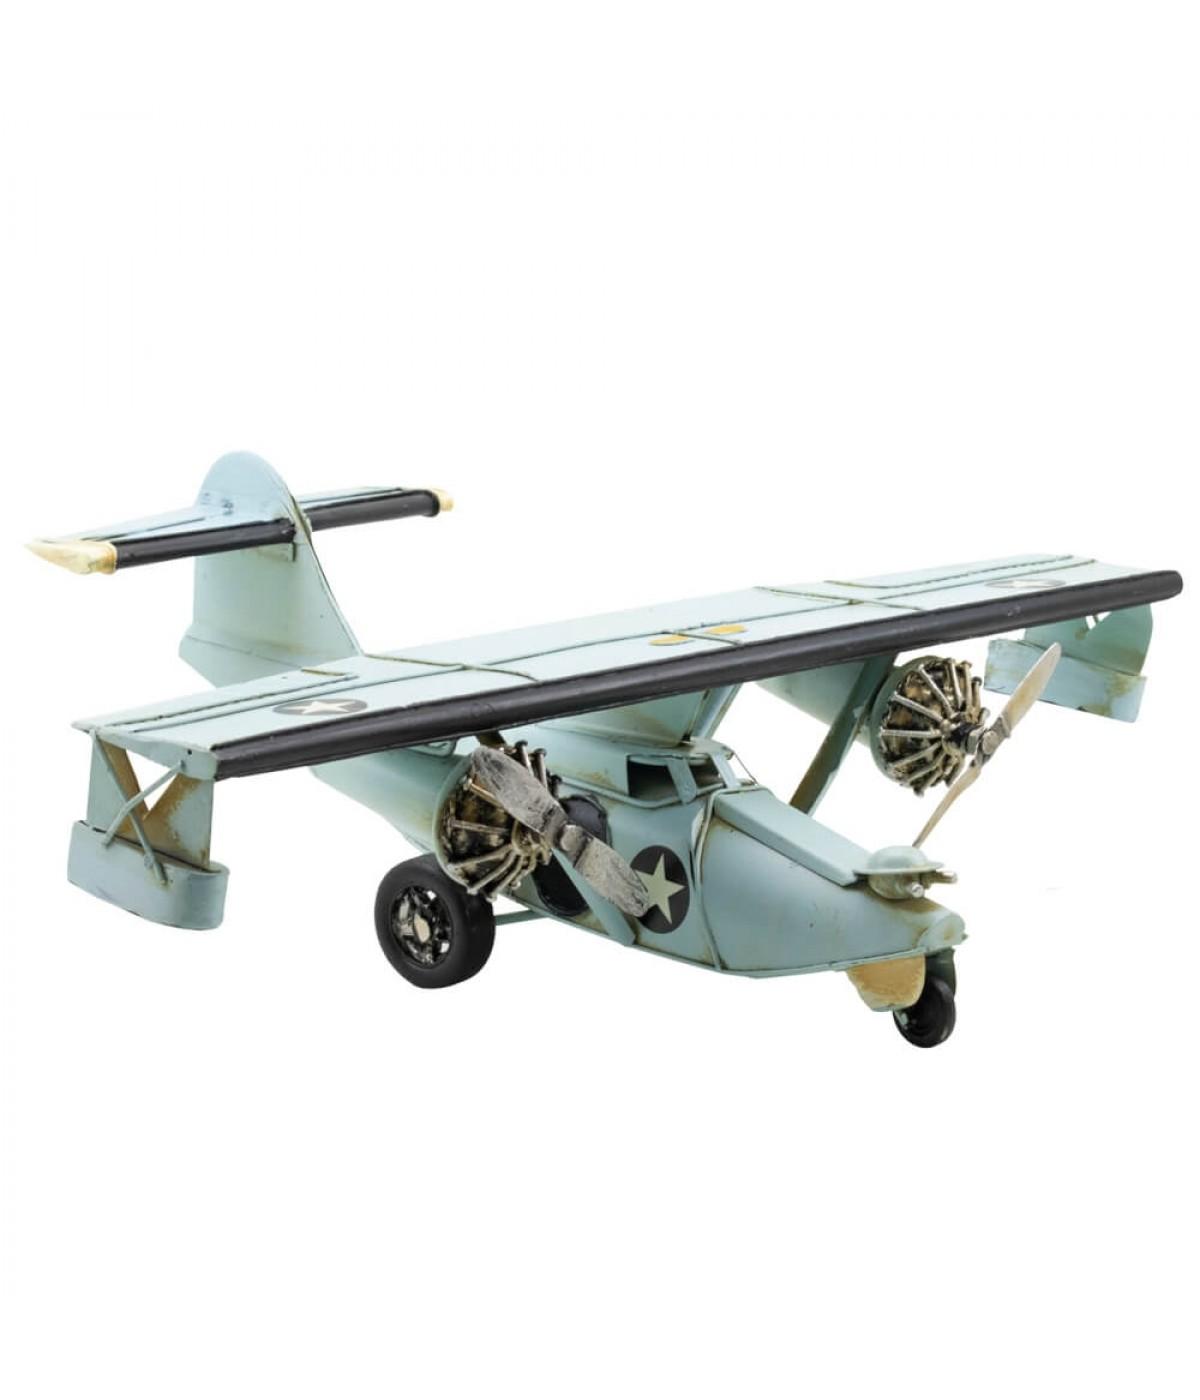 Avião Azul 2 Hélices 35cm Estilo Retrô - Vintage